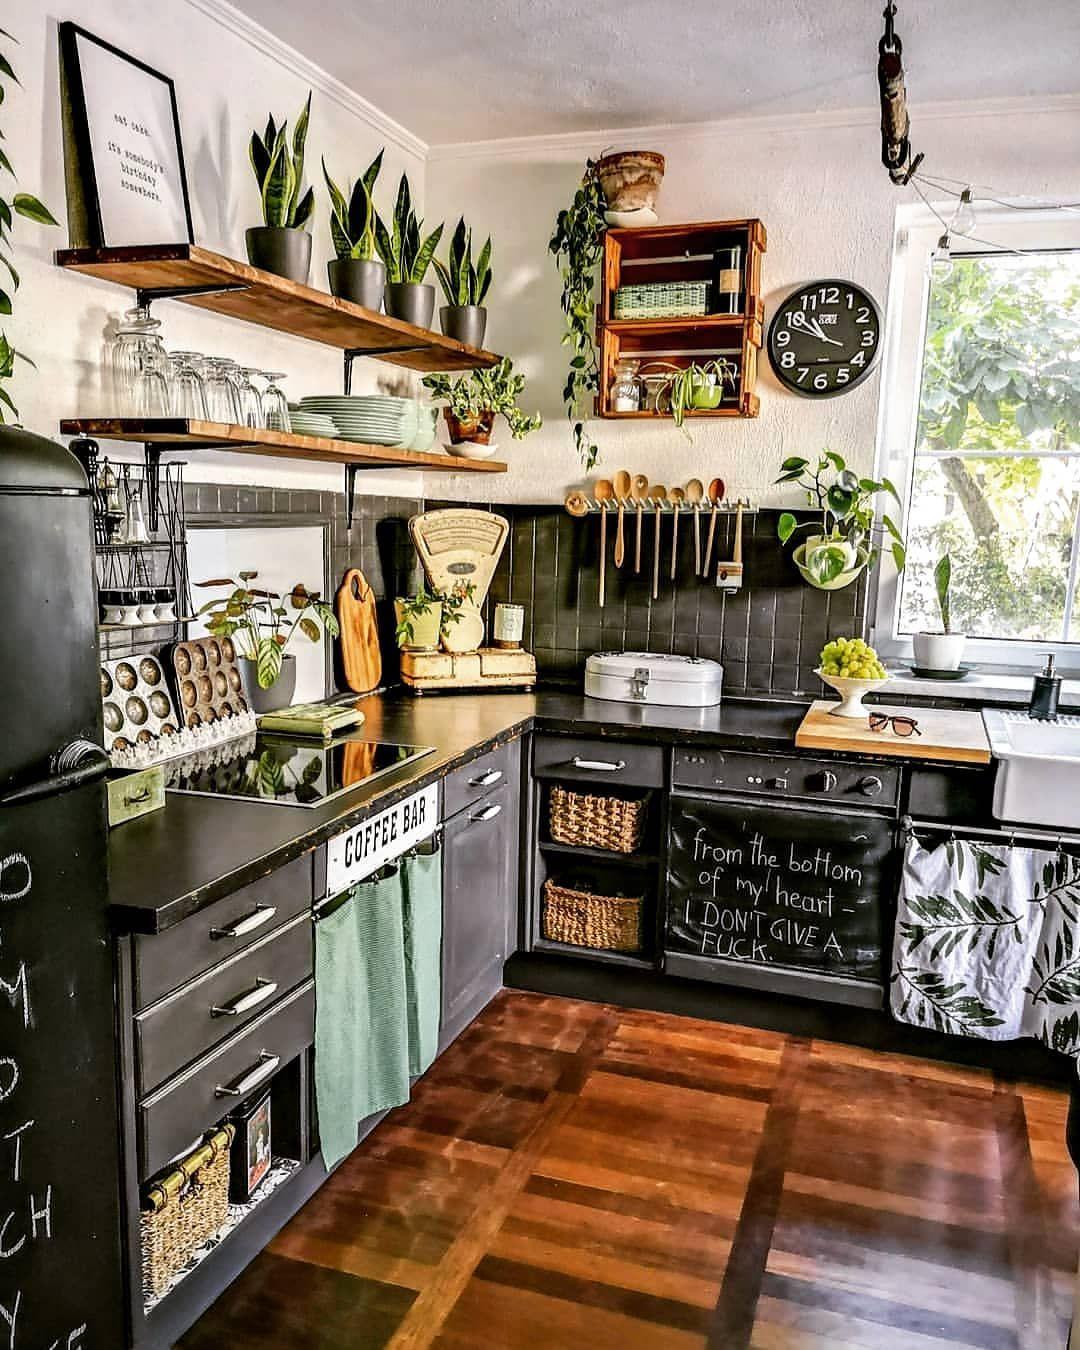 Get Home Design Ideas: Top Ideas To Get Boho Style Kitchen